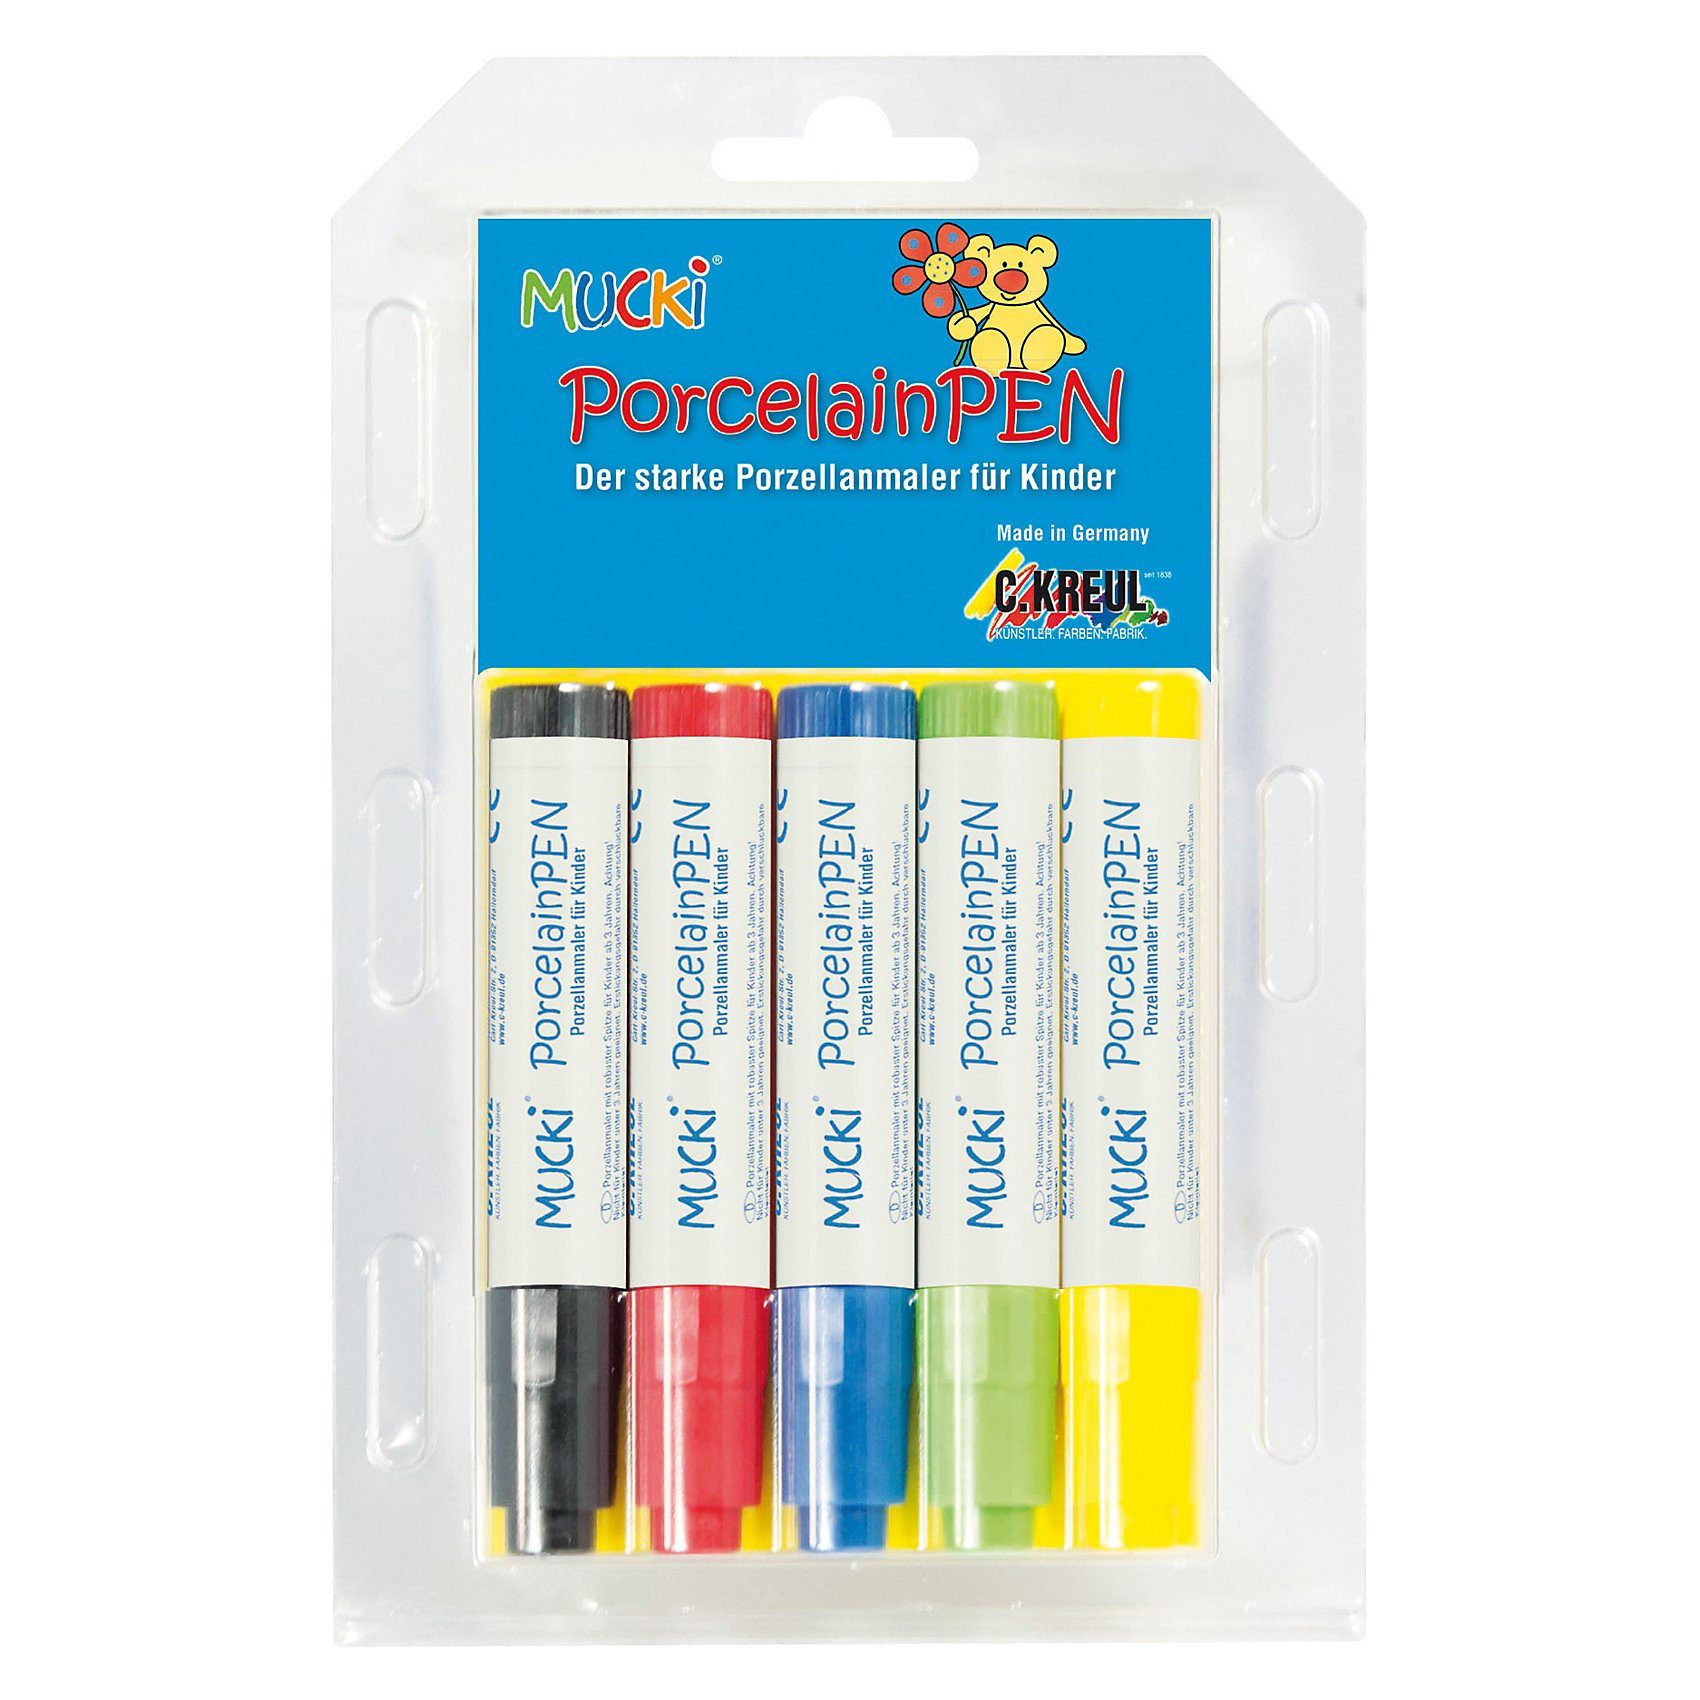 C. KREUL Mucki Porzellanmalstifte Porcelain Pen, 5 Farben